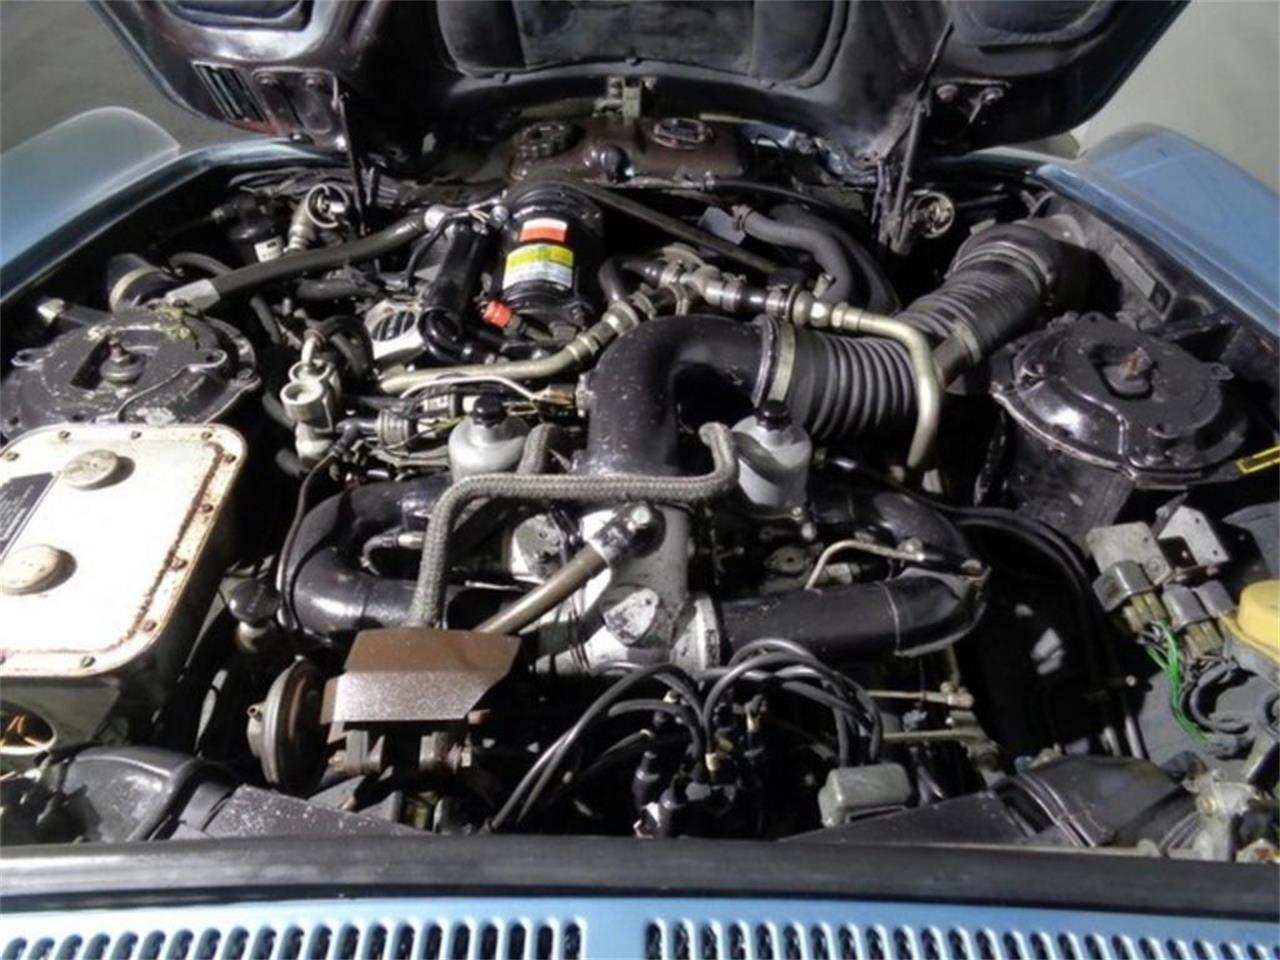 1980 Rolls Royce Silver Wraith Ii For Sale Classiccars